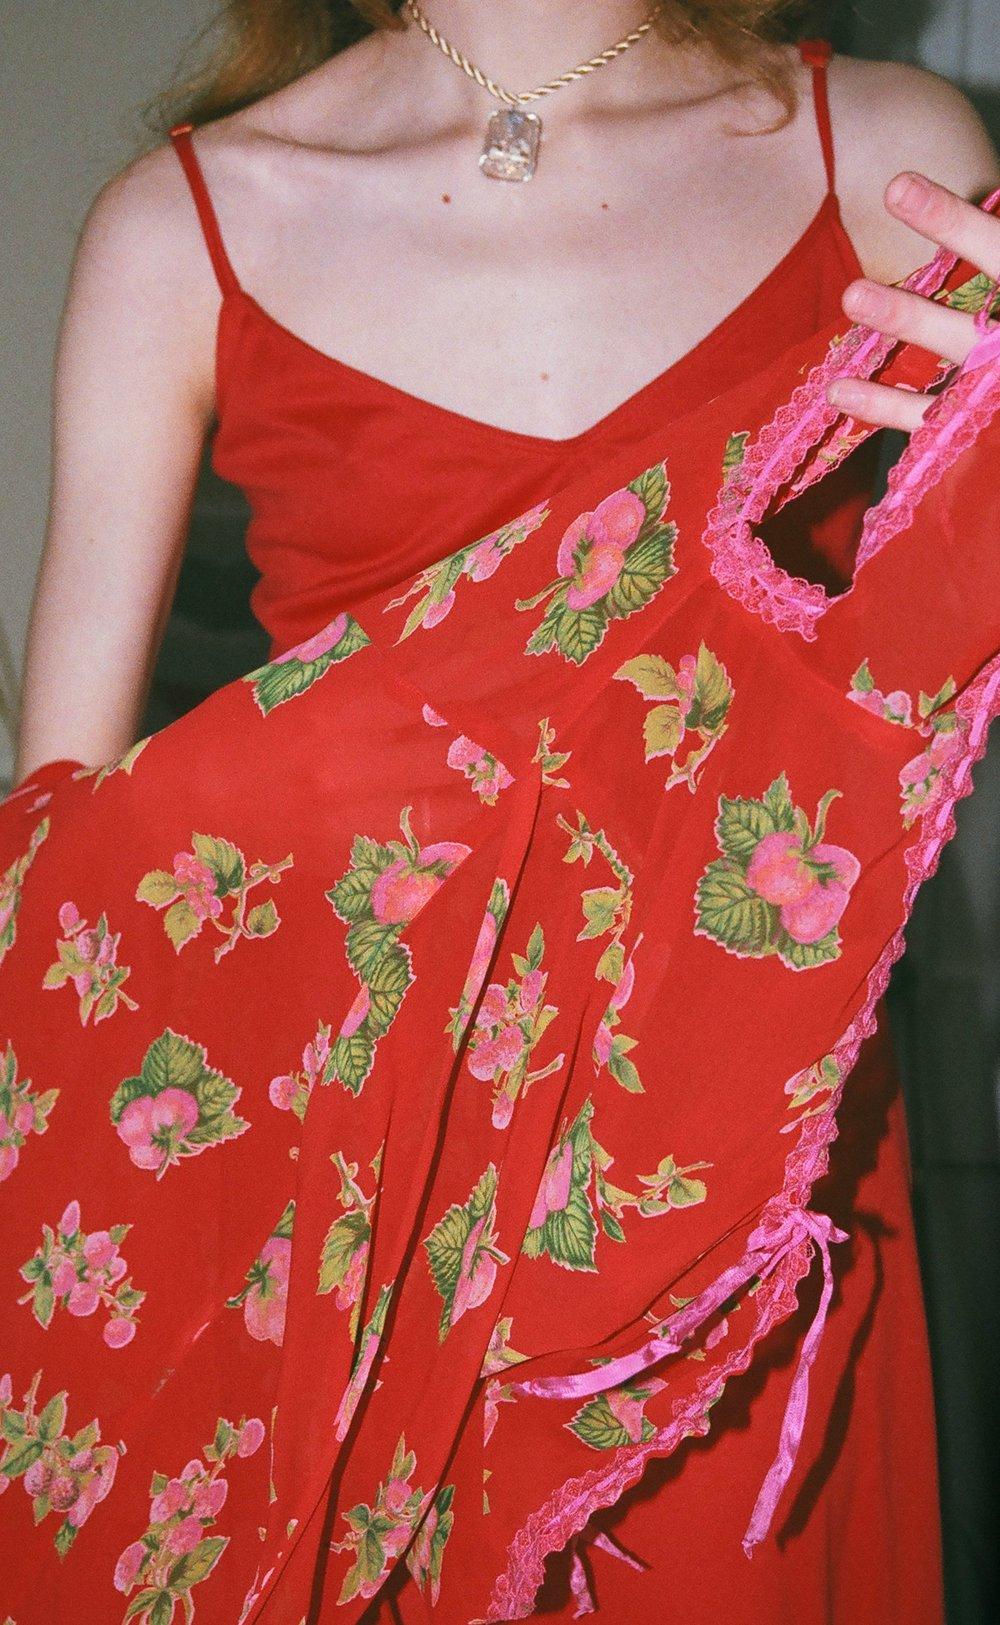 strawberry dress 2.jpg